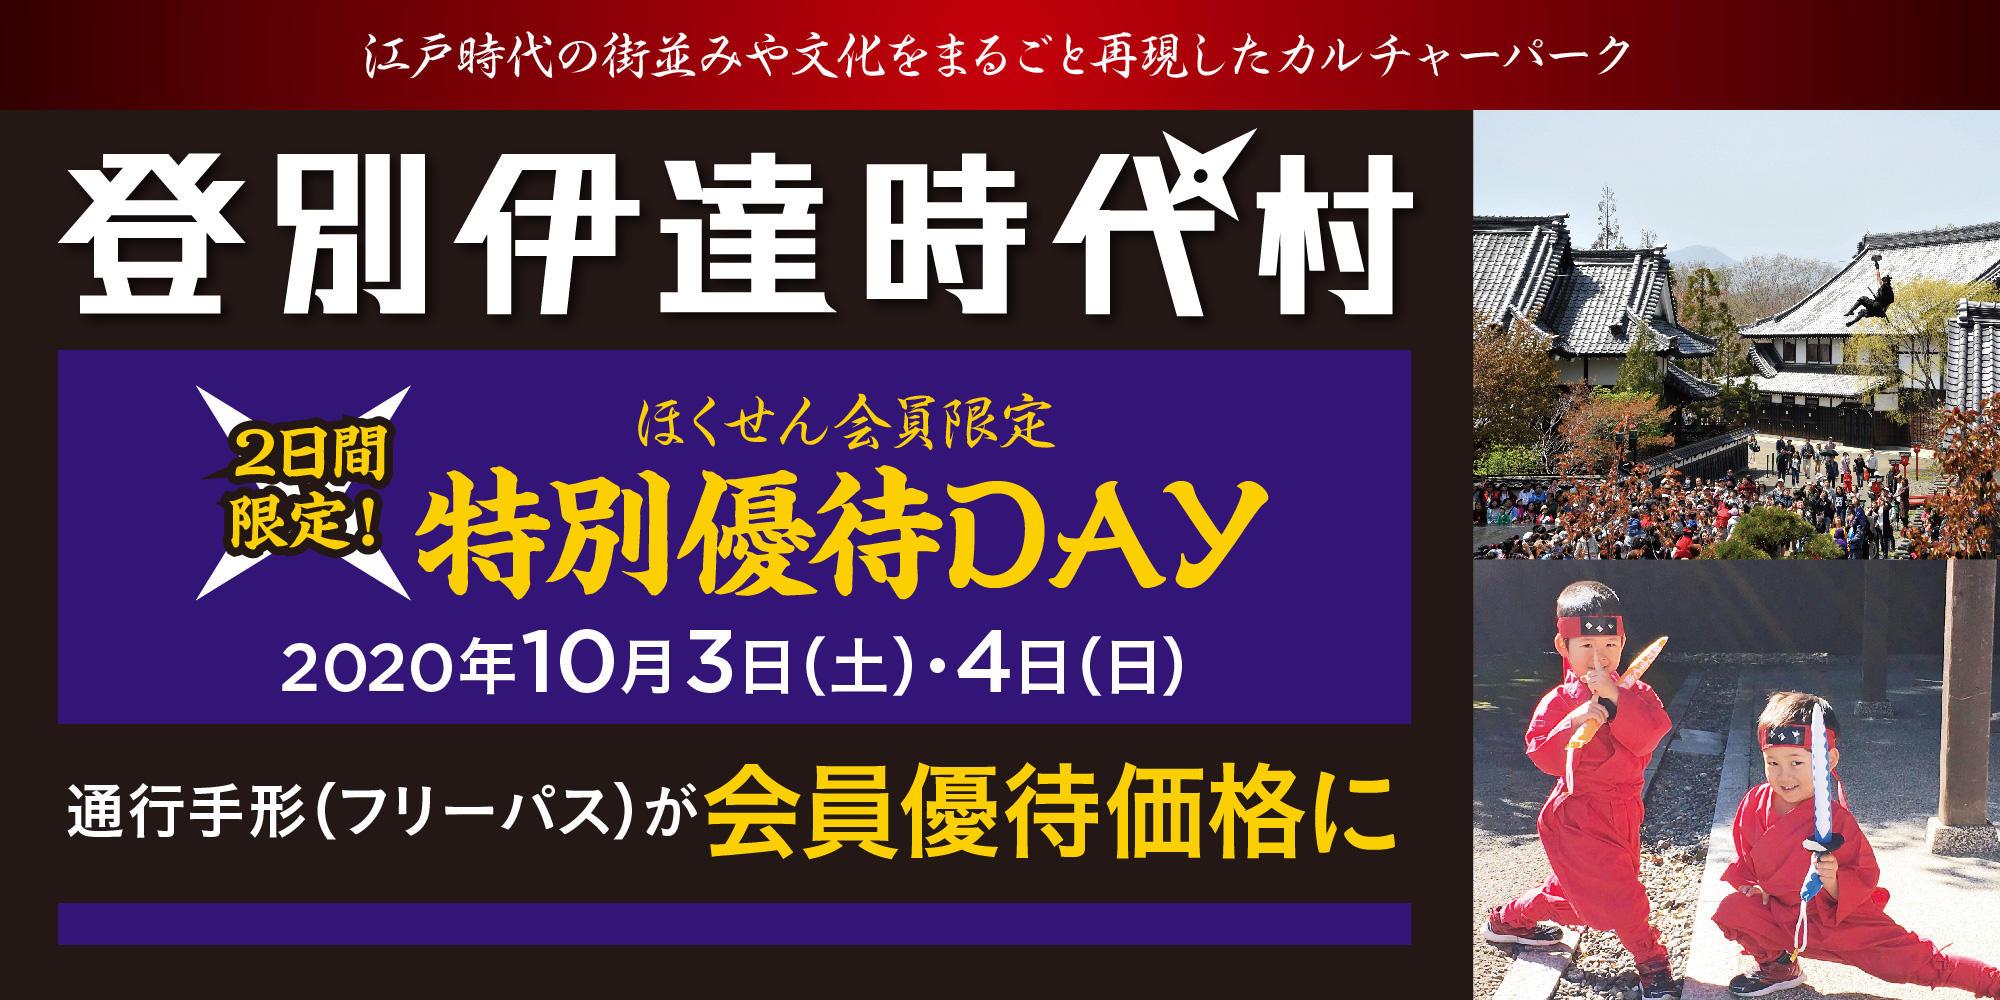 202010_hp_datejidai-01.jpg